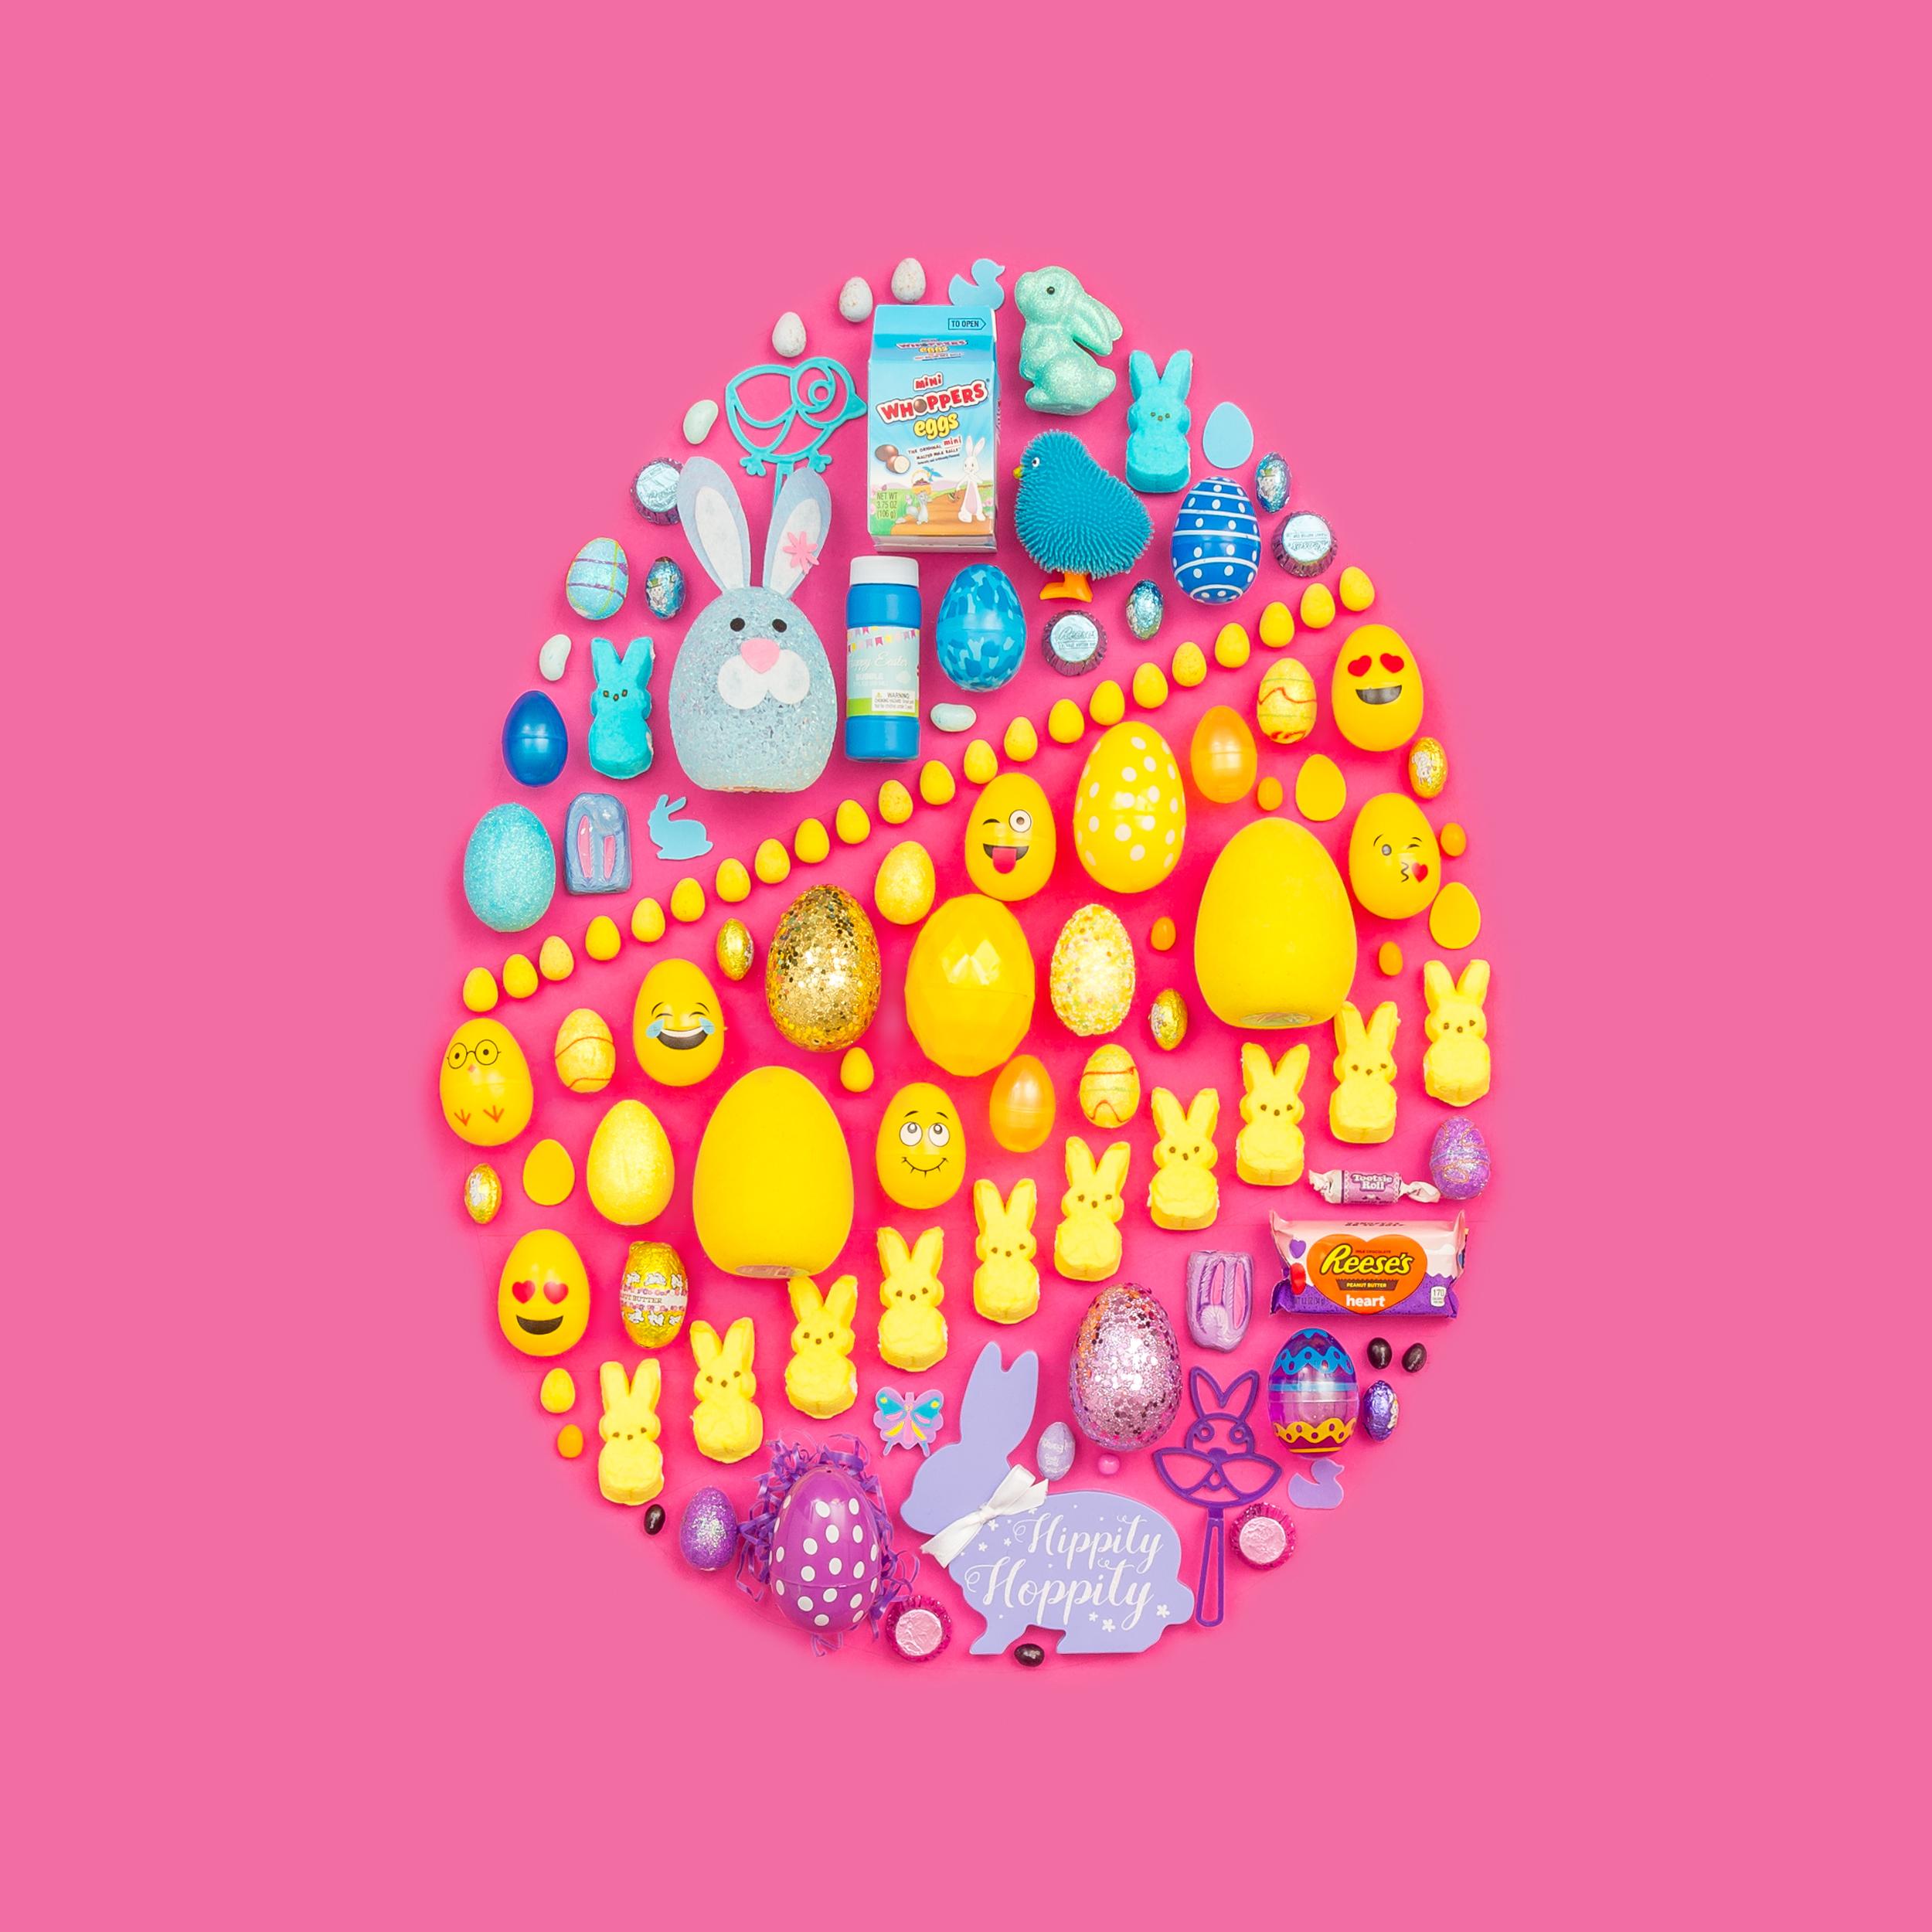 PINK_03_RGB.jpg